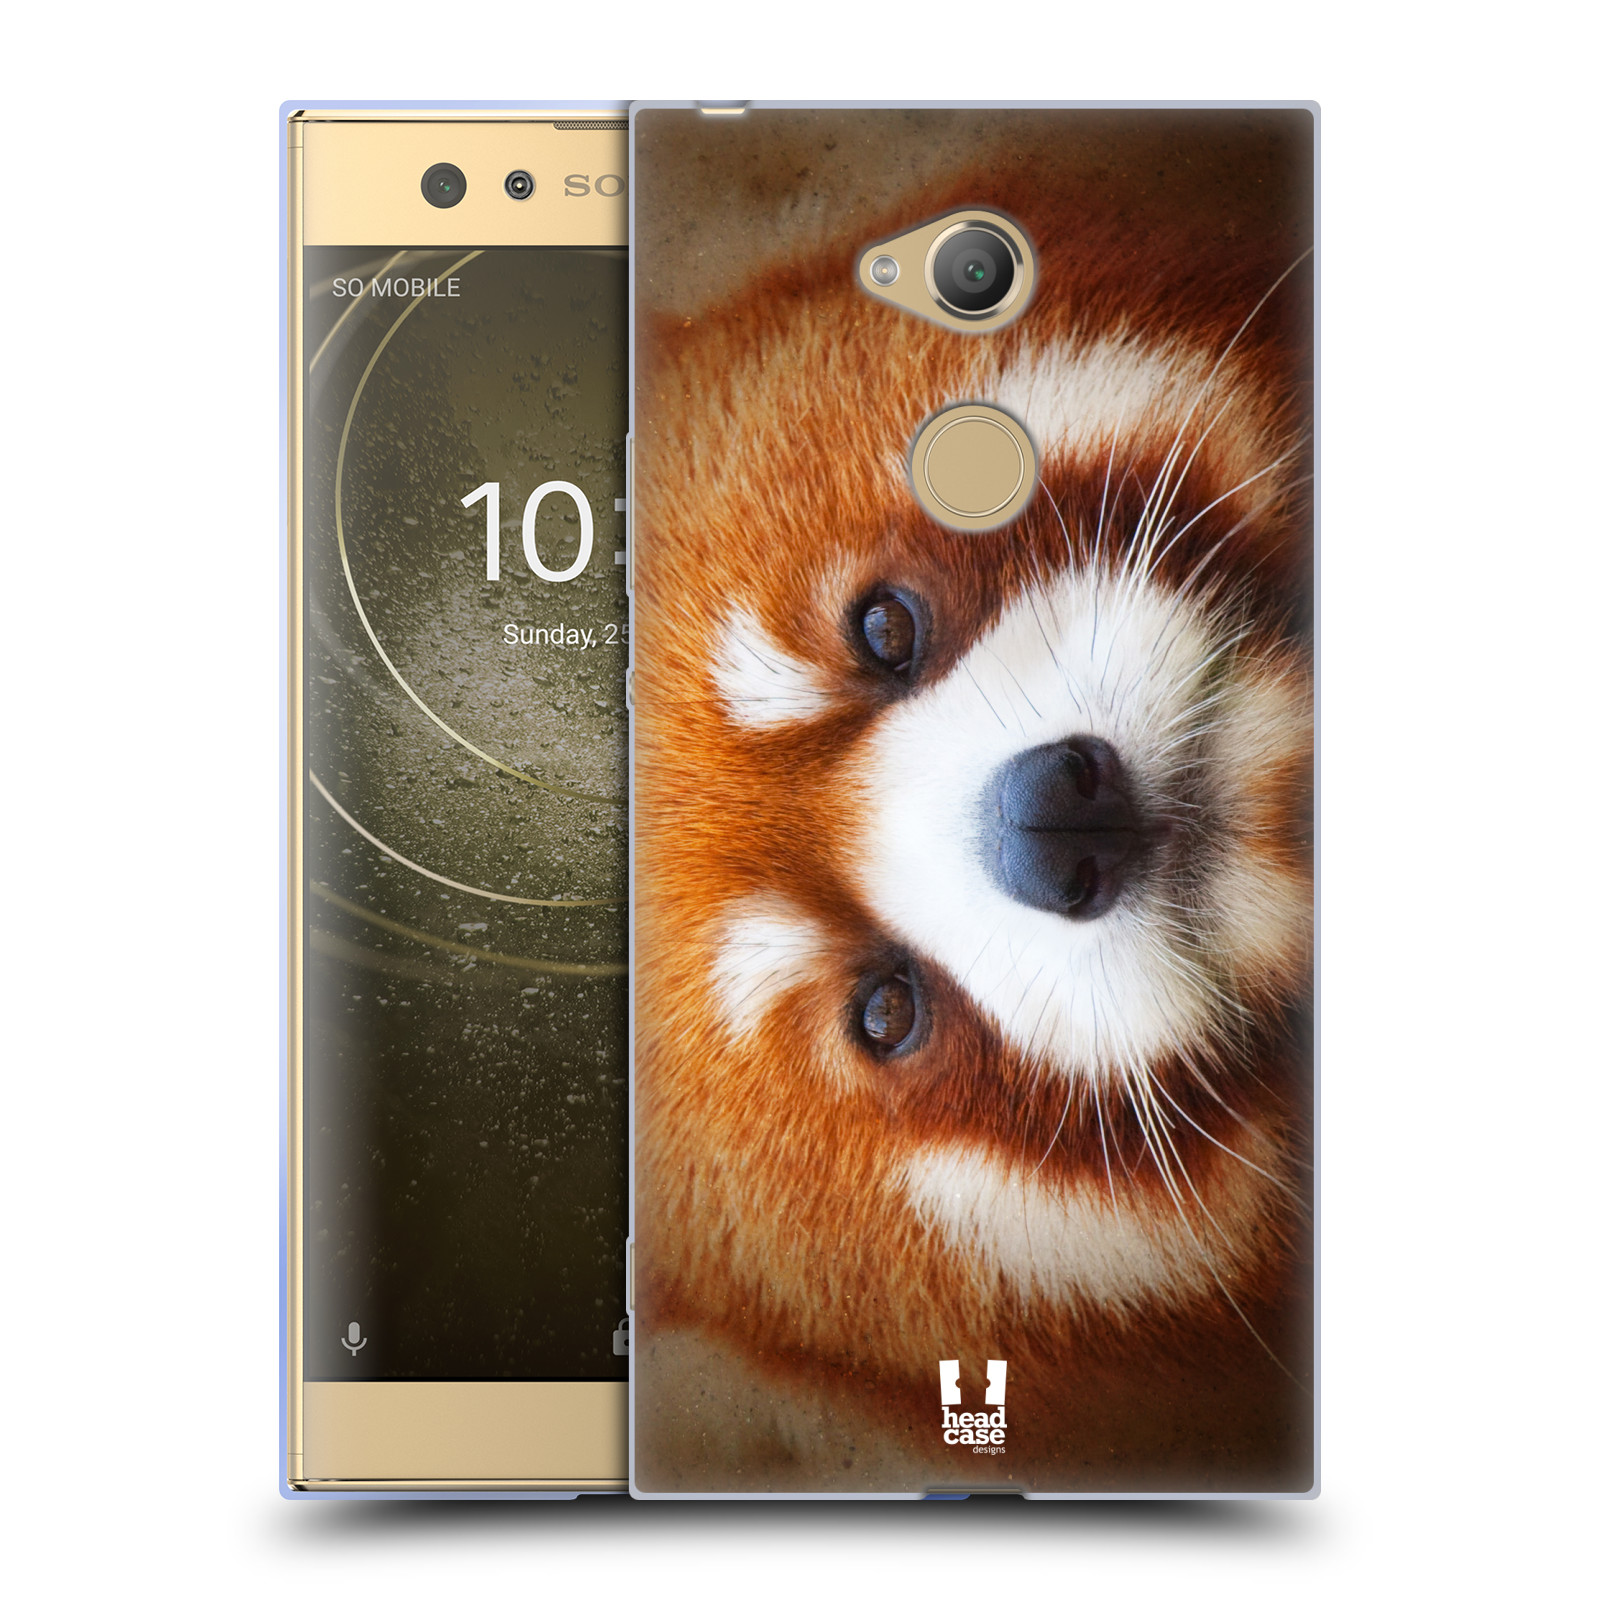 Pouzdro na mobil Sony Xperia XA2 Ultra vzor Zvířecí tváře 2 medvěd panda rudá